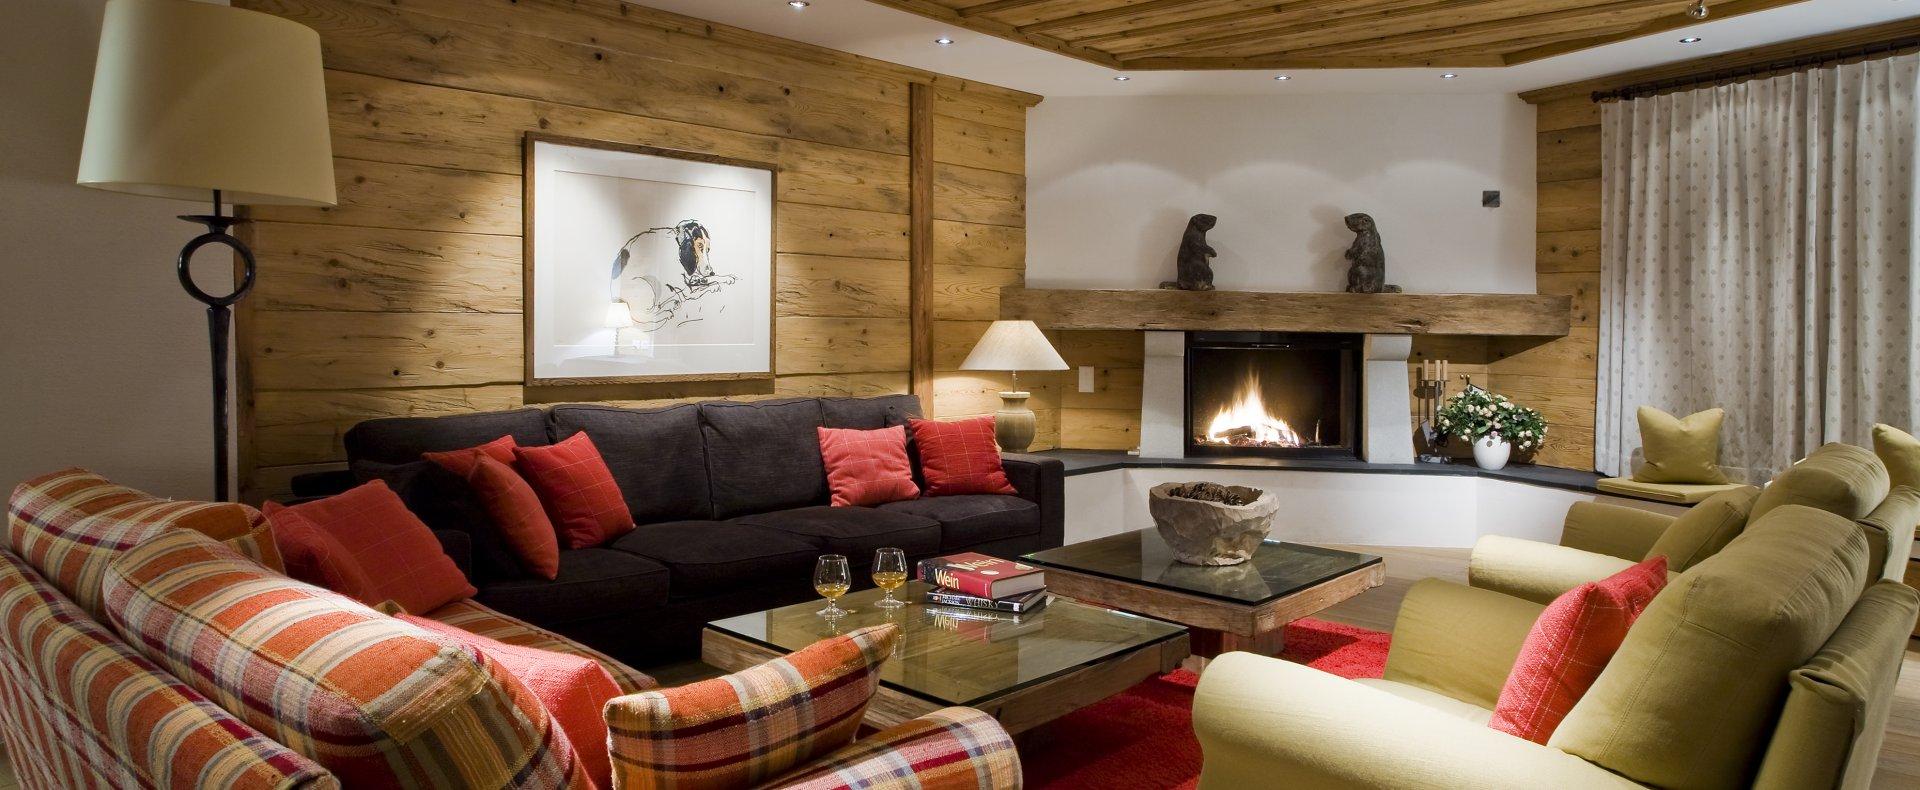 Chalet Chesa Falcun, Ski Klosters, Switzerland, Ultimate Luxury ...